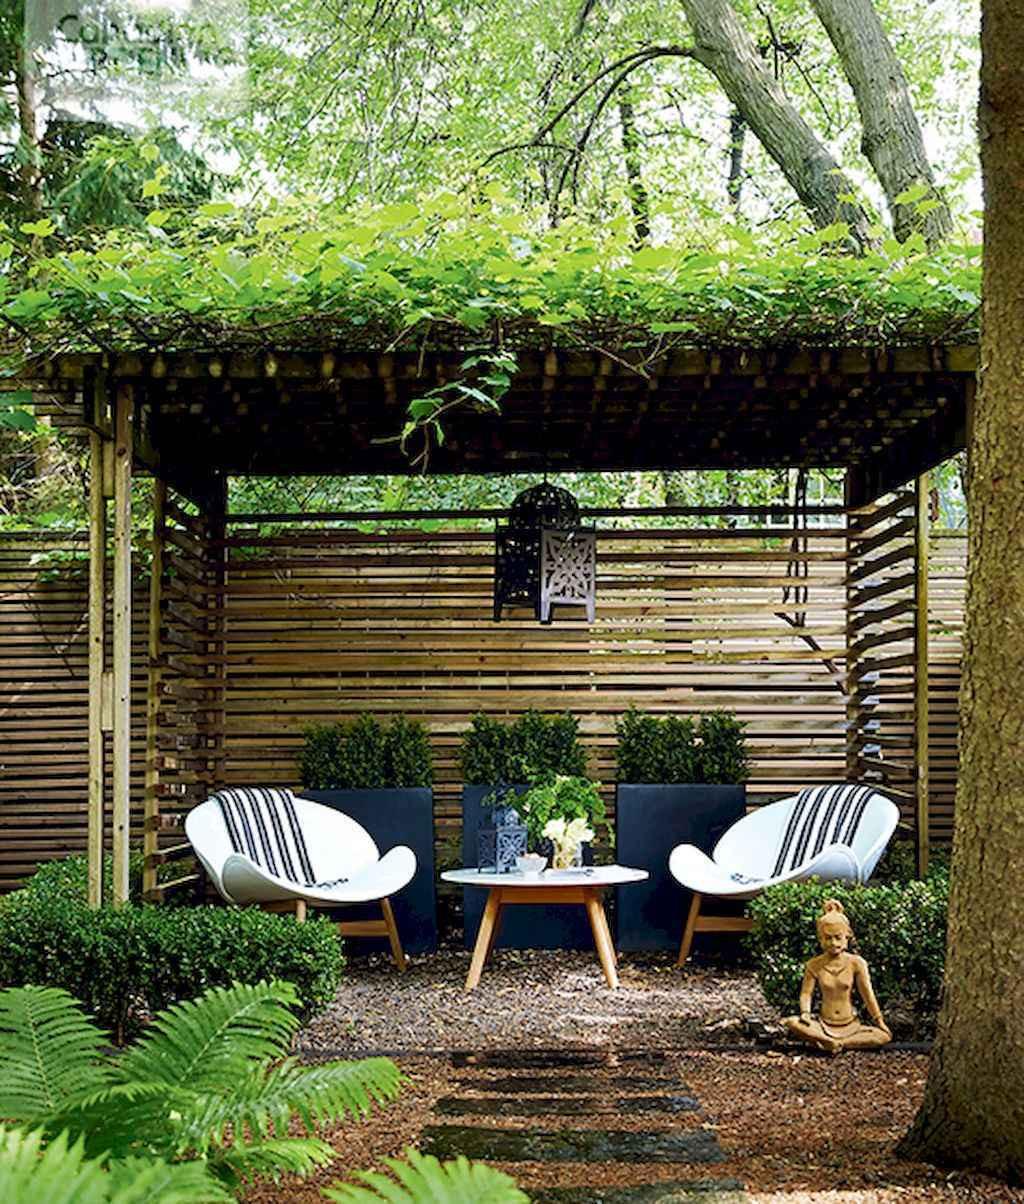 Best ideas about Cheap DIY Backyard Ideas . Save or Pin 70 Creative DIY Backyard Privacy Ideas A Bud Now.